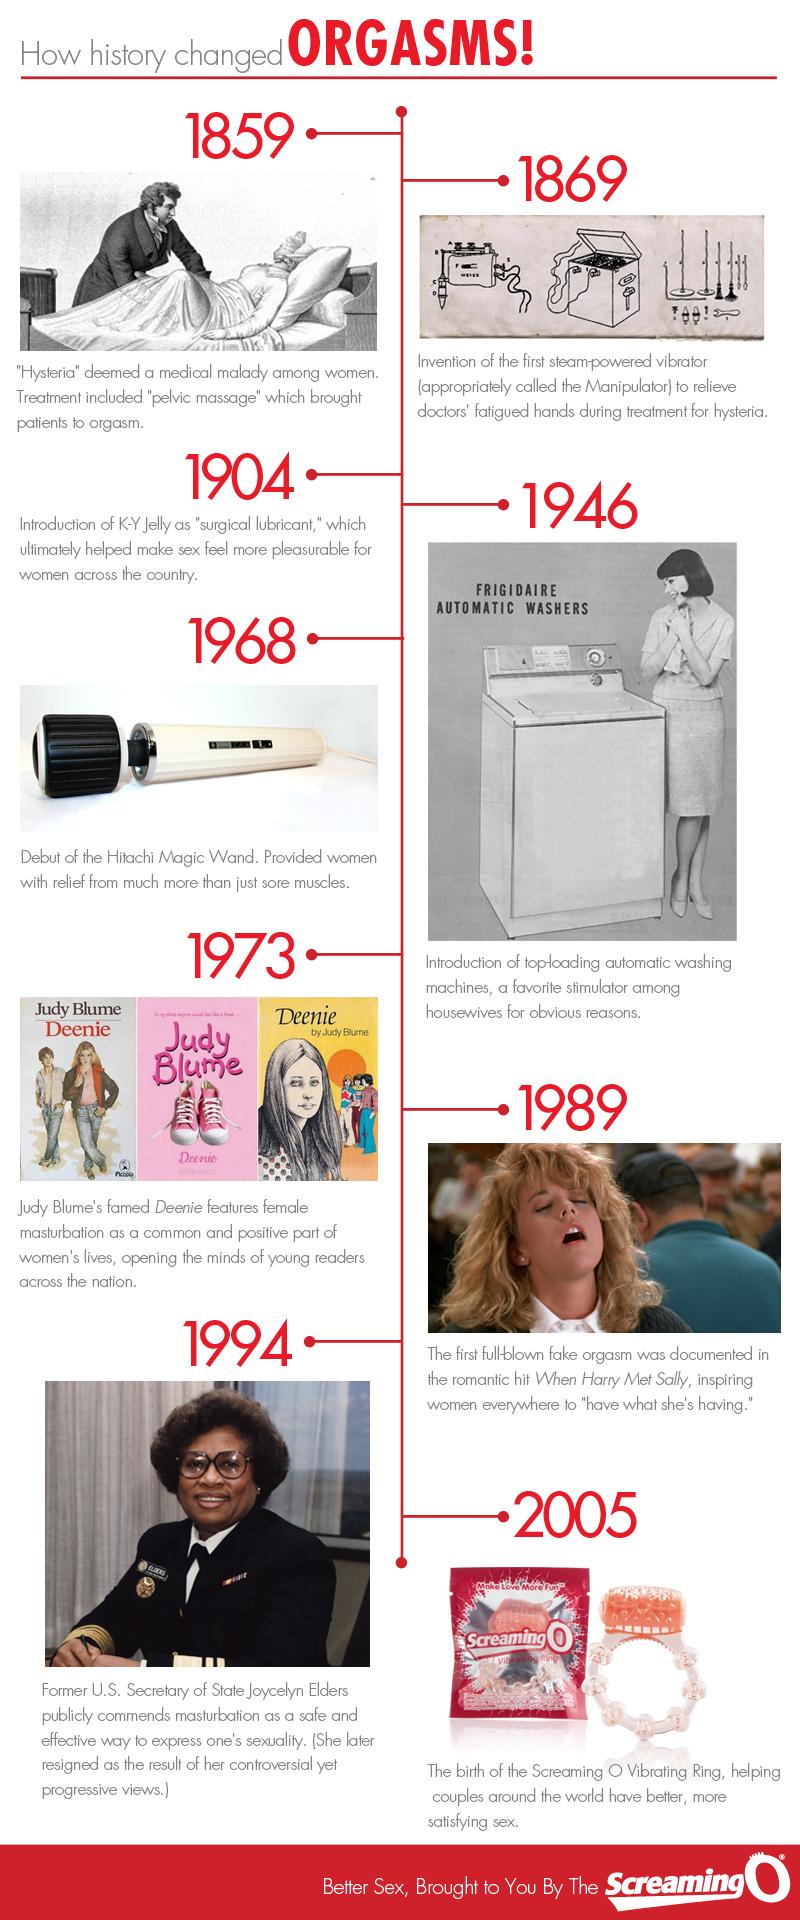 Orgasm_History_Timeline